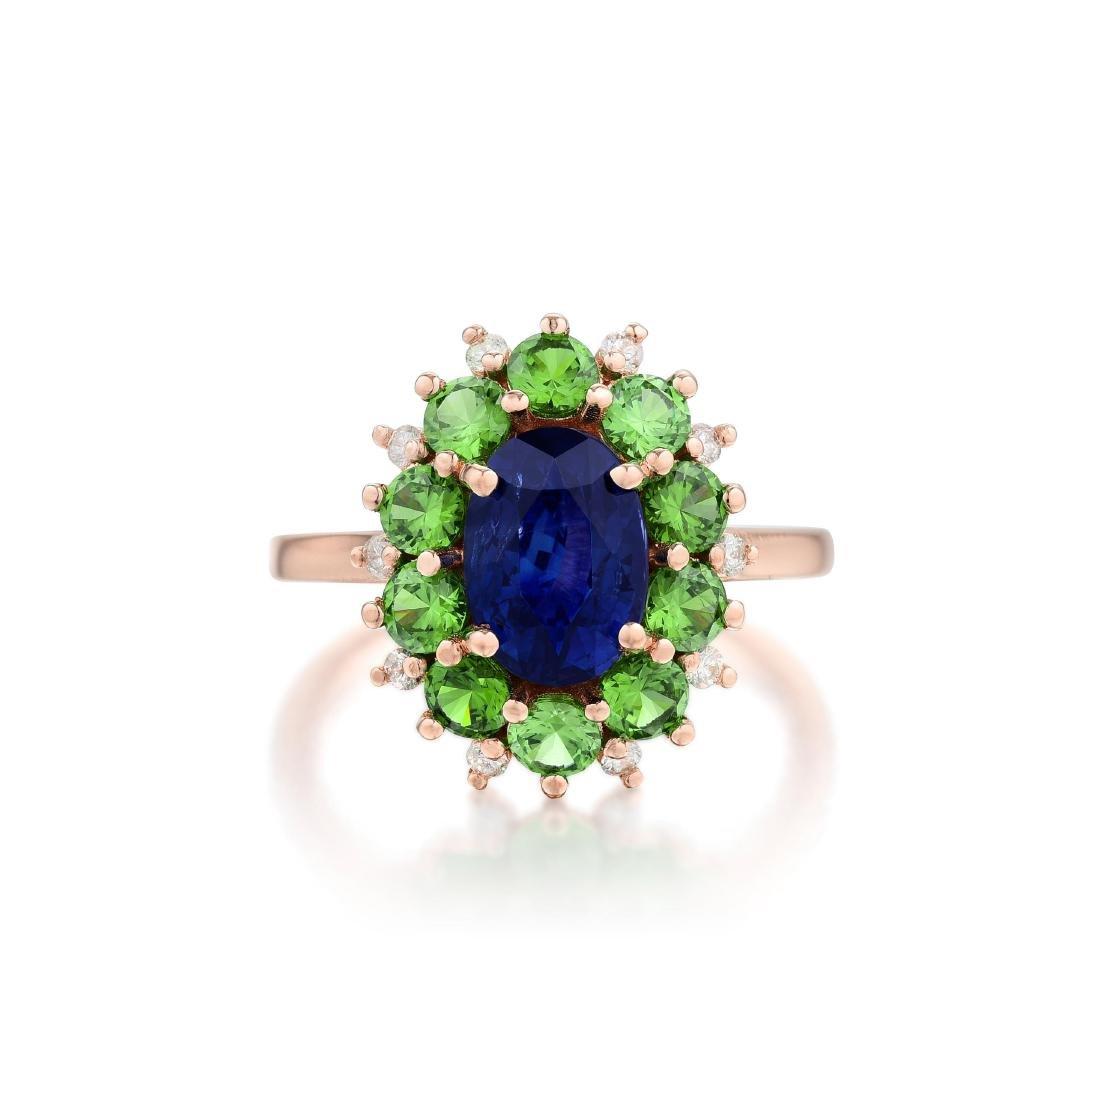 A Sapphire Demantoid Garnet and Diamond Ring